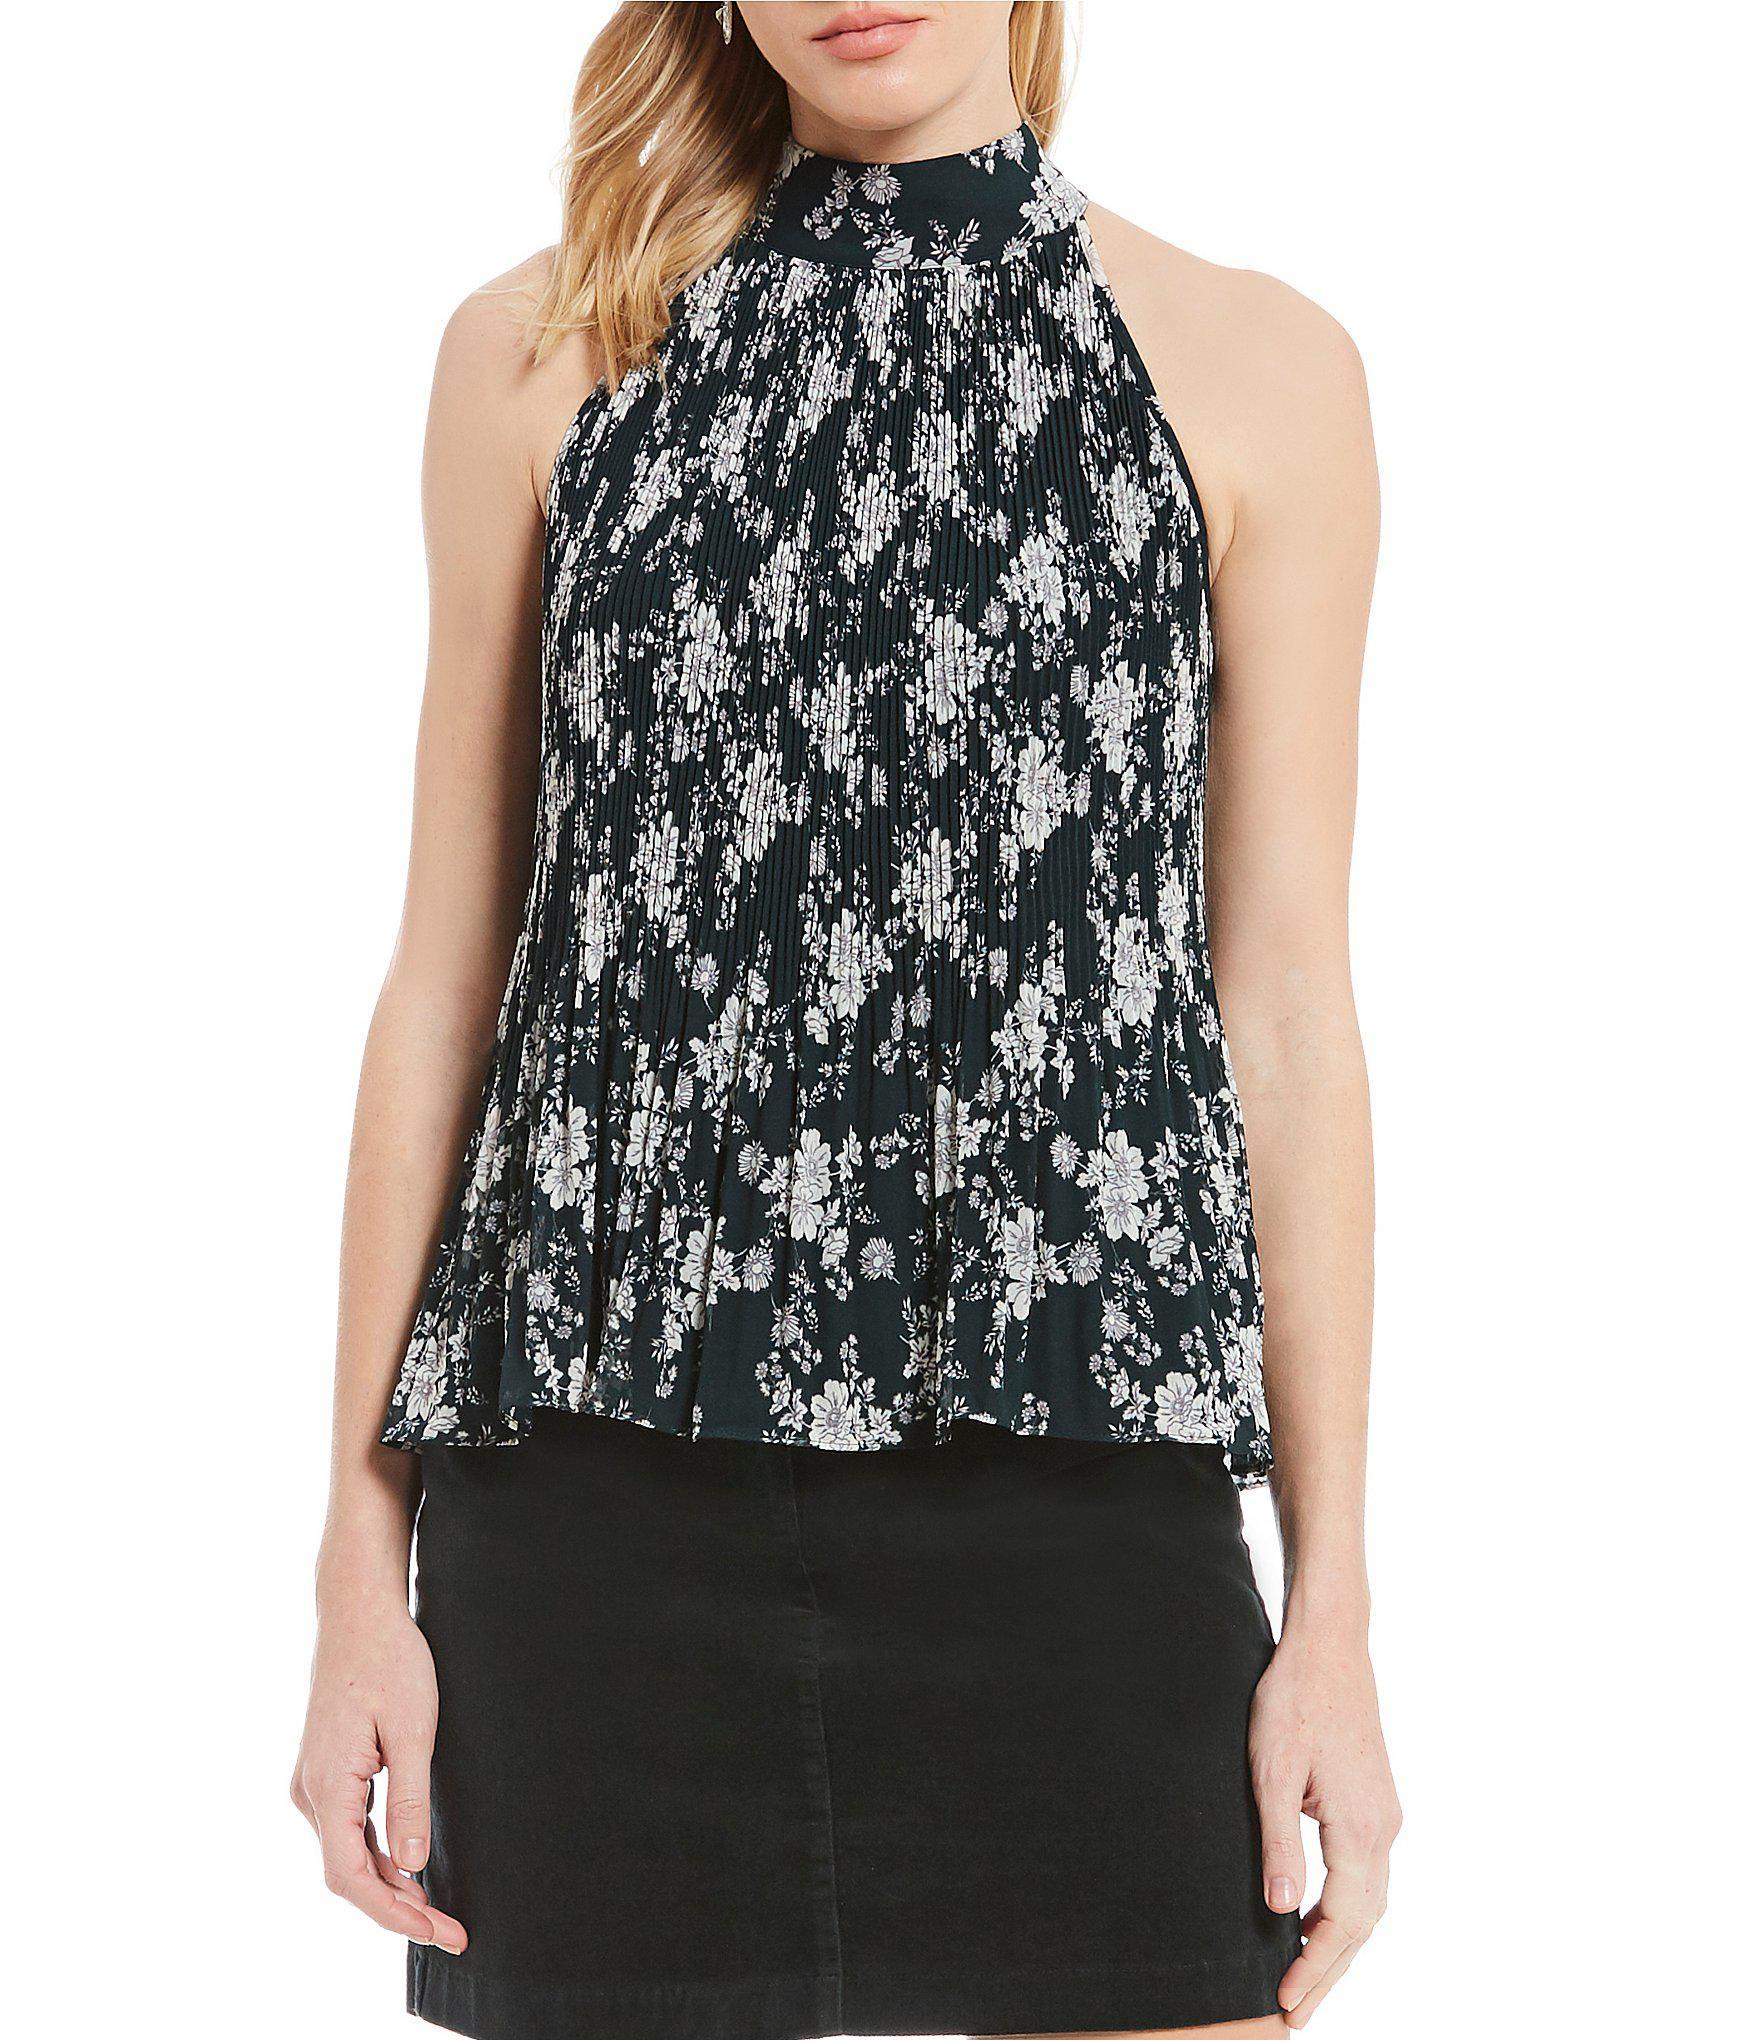 STATE - Black Gauze Chiffon Pleated Floral Print Halter Top - Lyst. View  fullscreen b11328d63